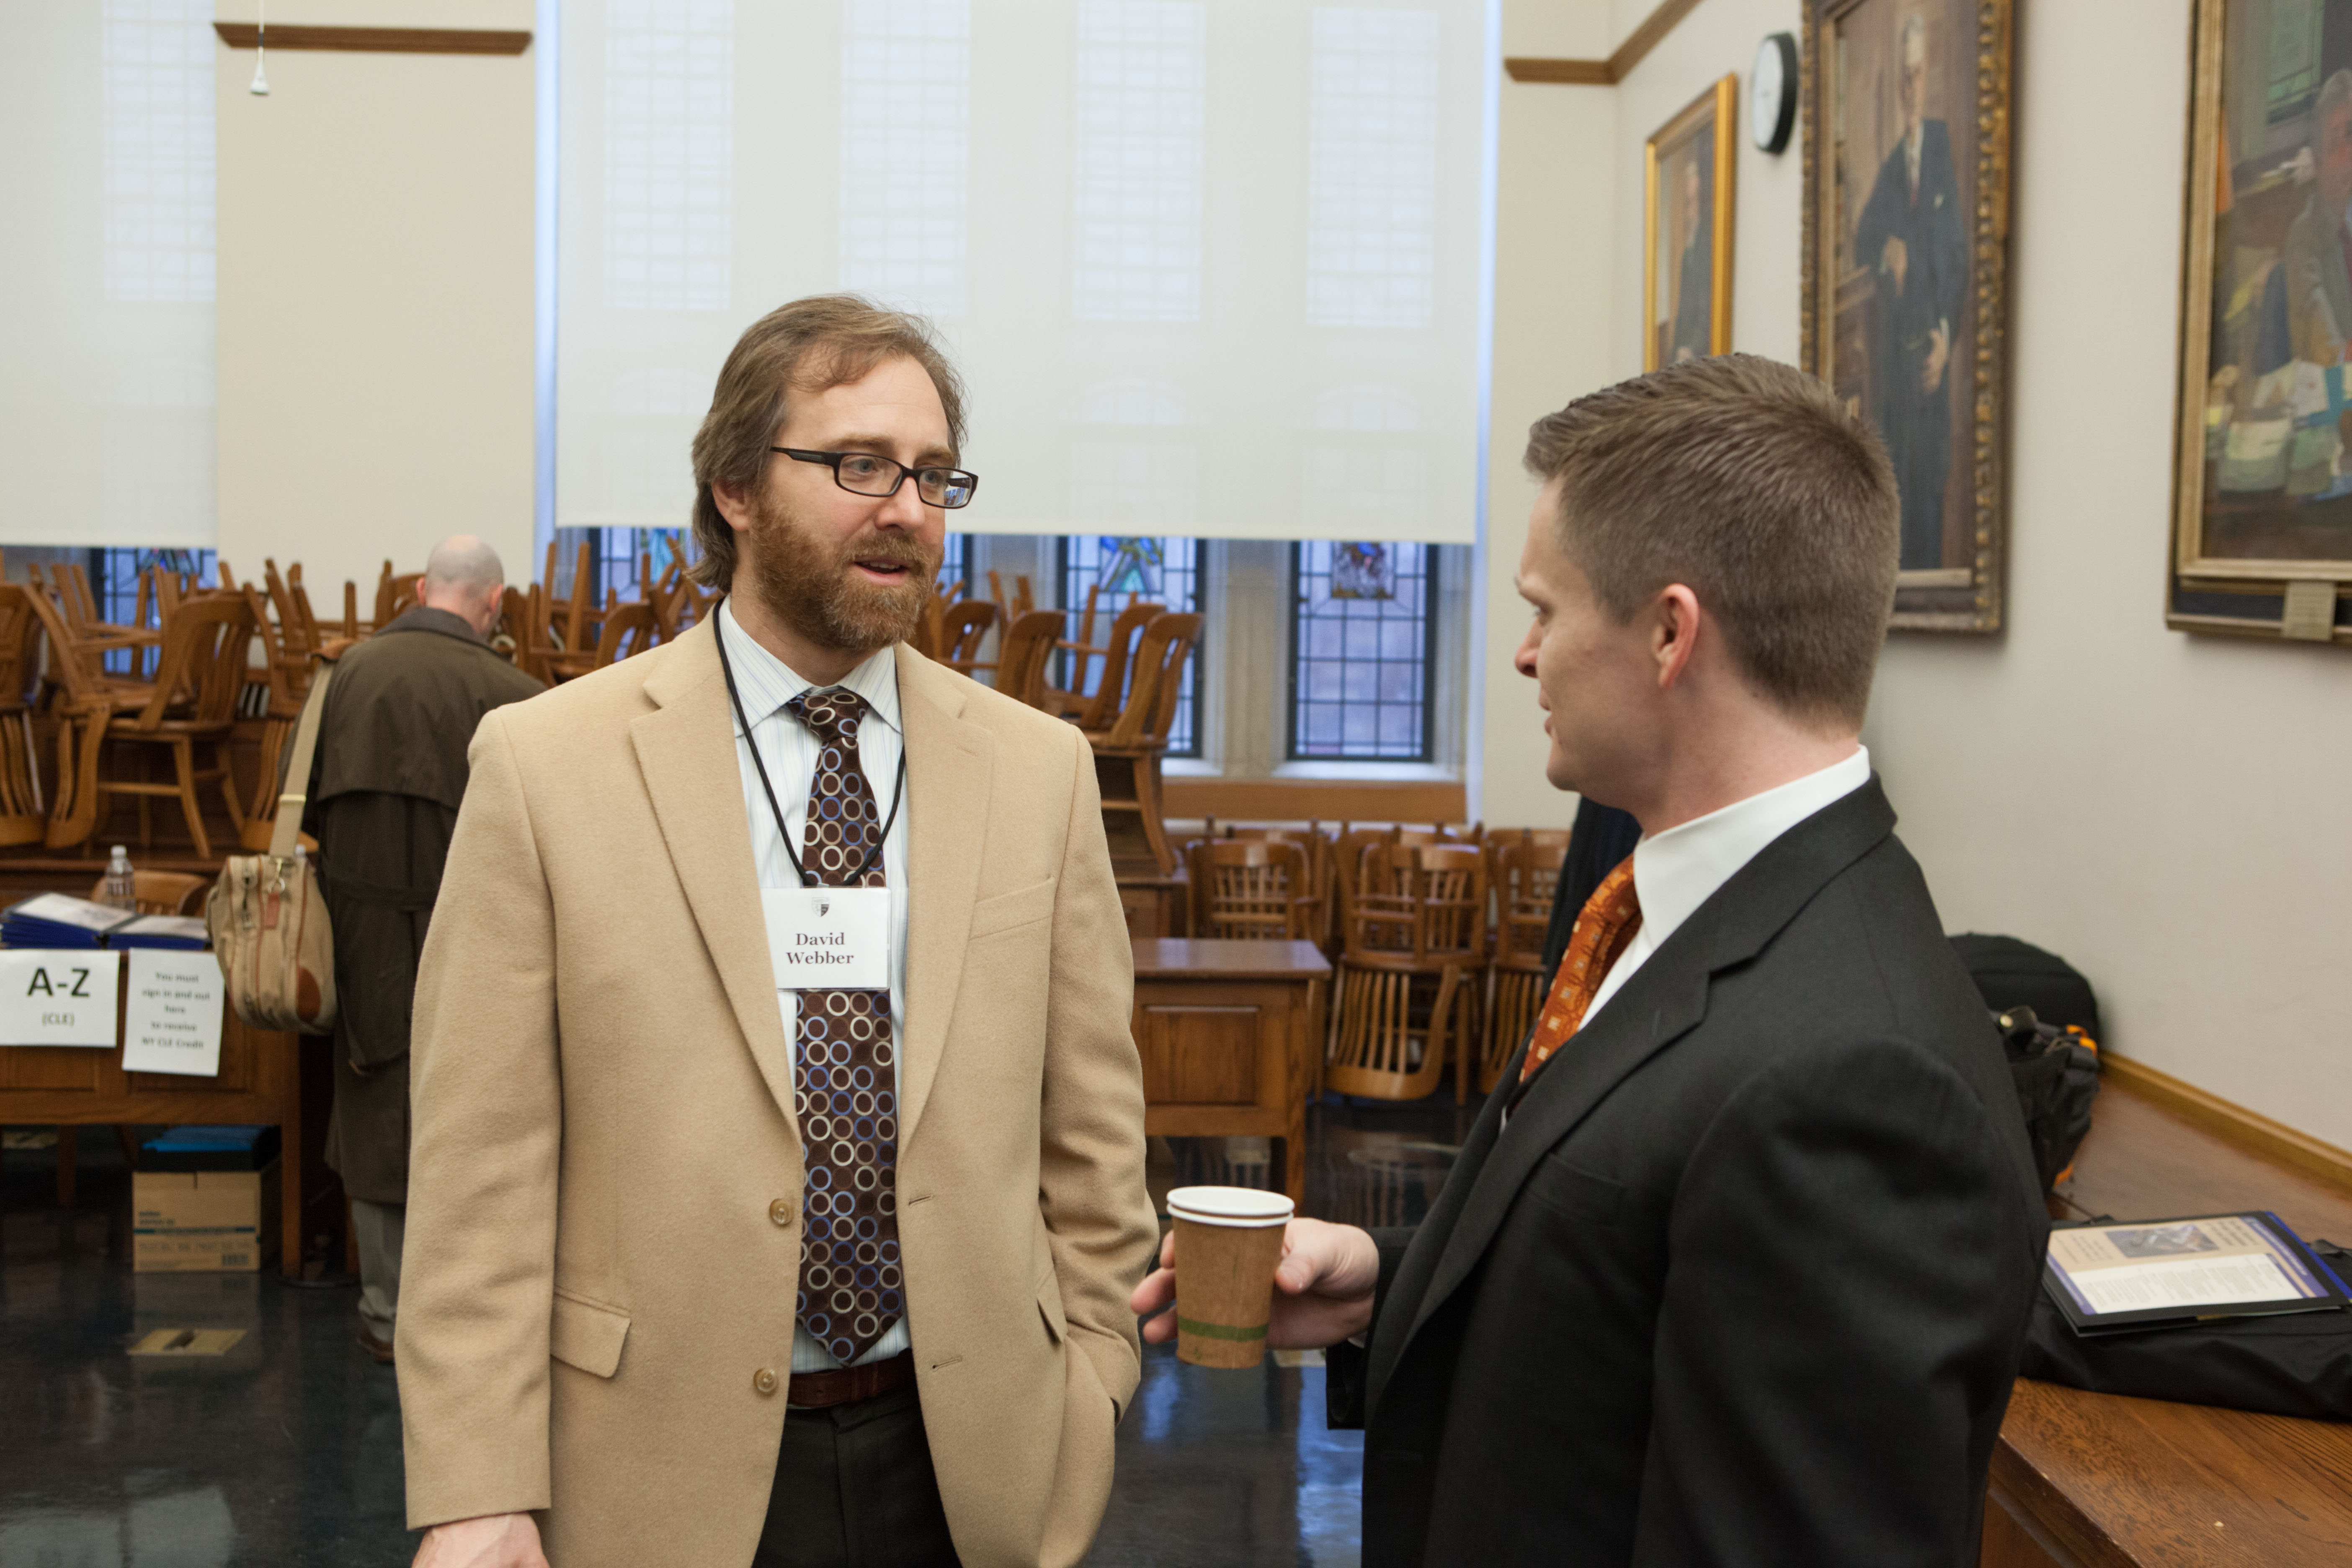 Boston U. Law Prof. David Webber and U. of Chicago Law Prof. Anthony Casey